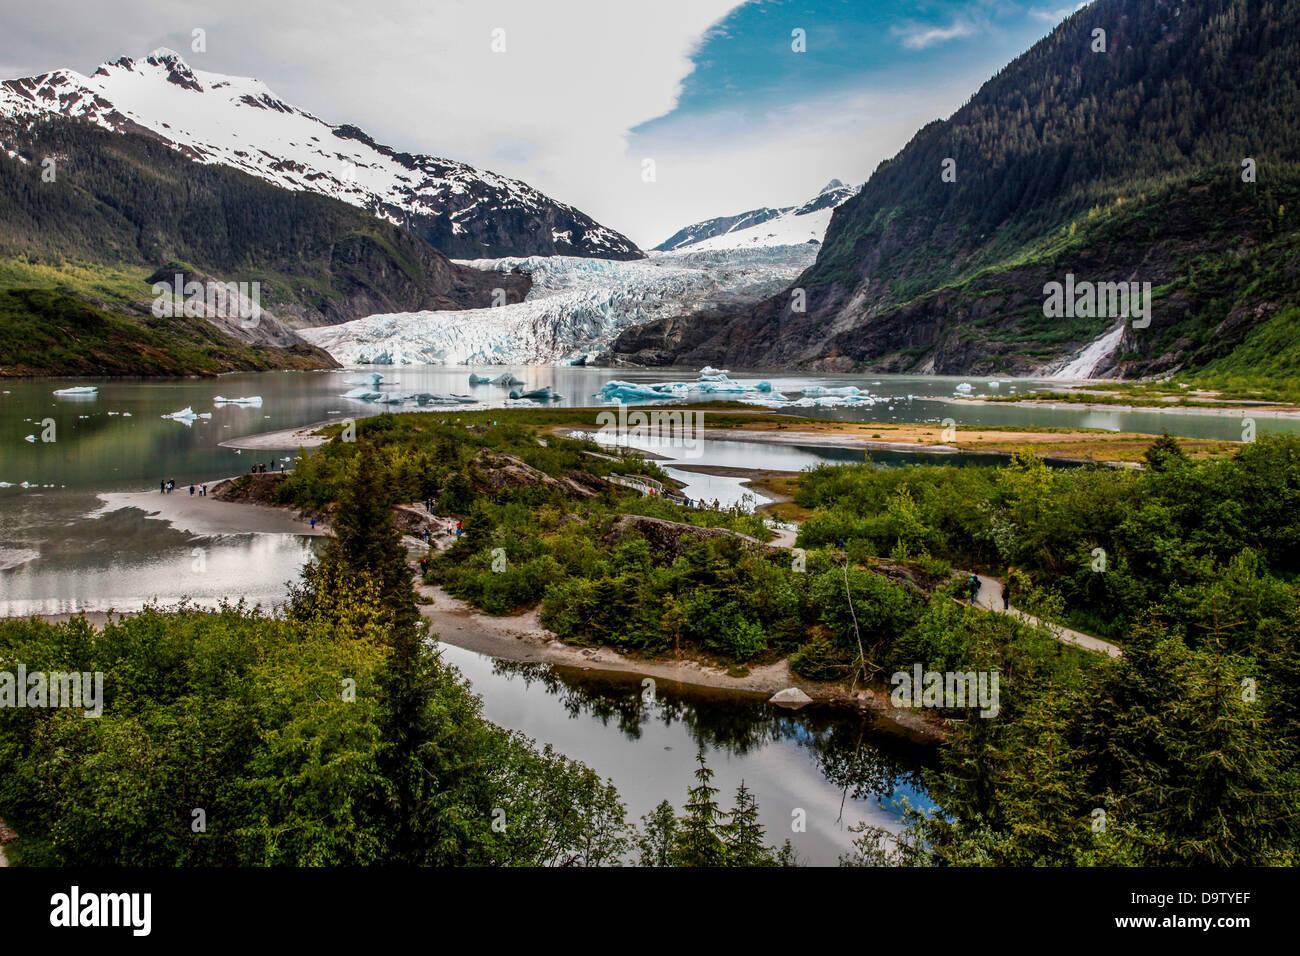 USA, Alaska, Mendenhall Glacier and Mendenhall Lake - Stock Image